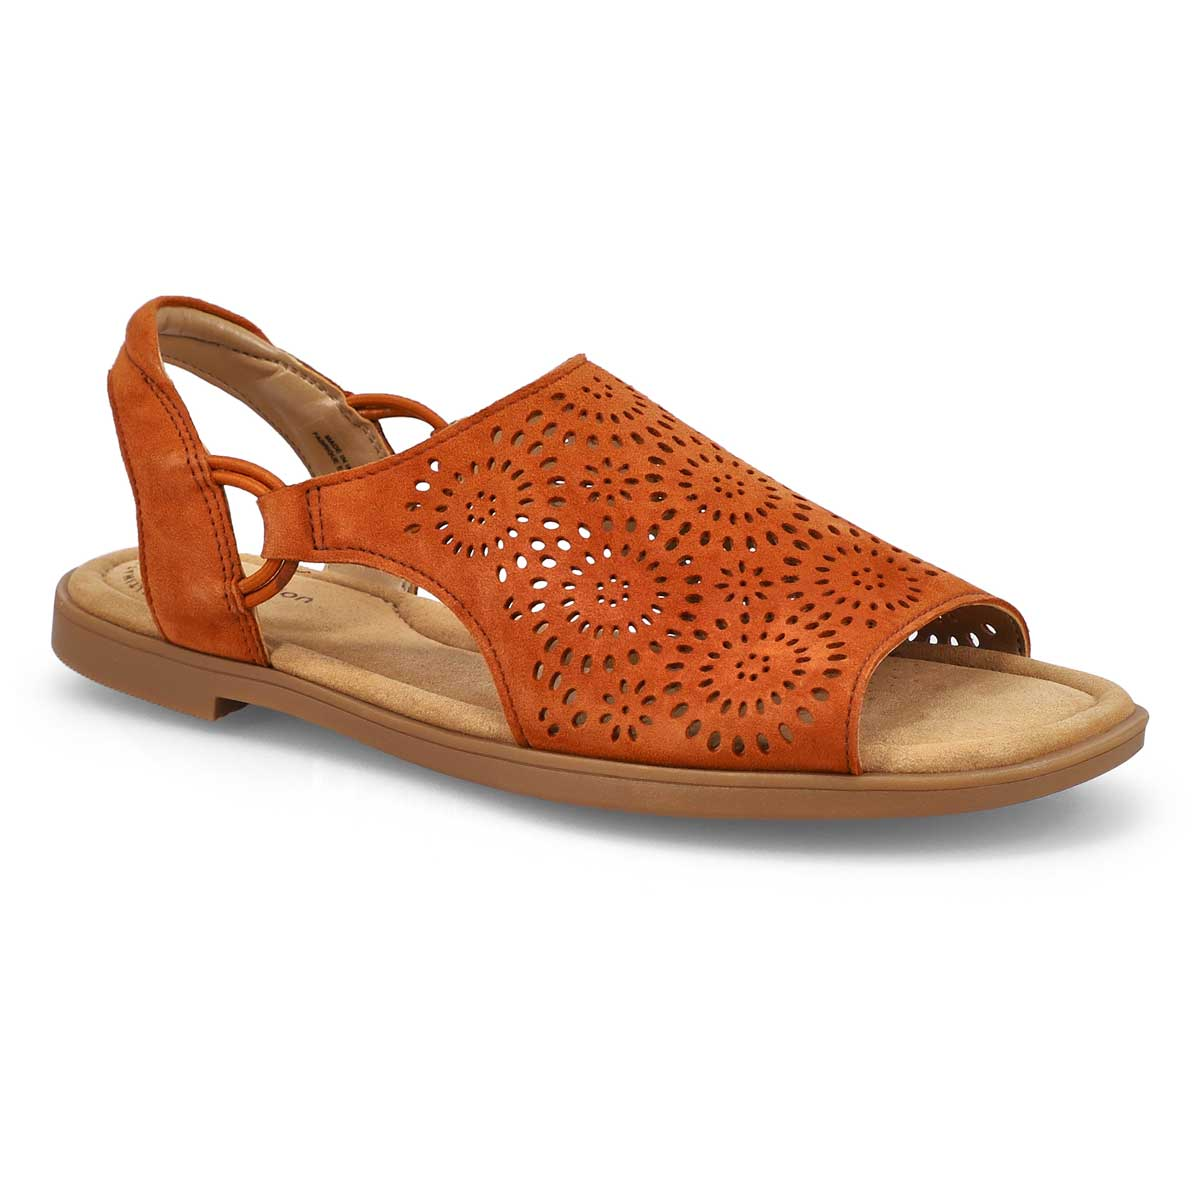 Women's Reyna Swirl Casual Sandal - Dark Tan